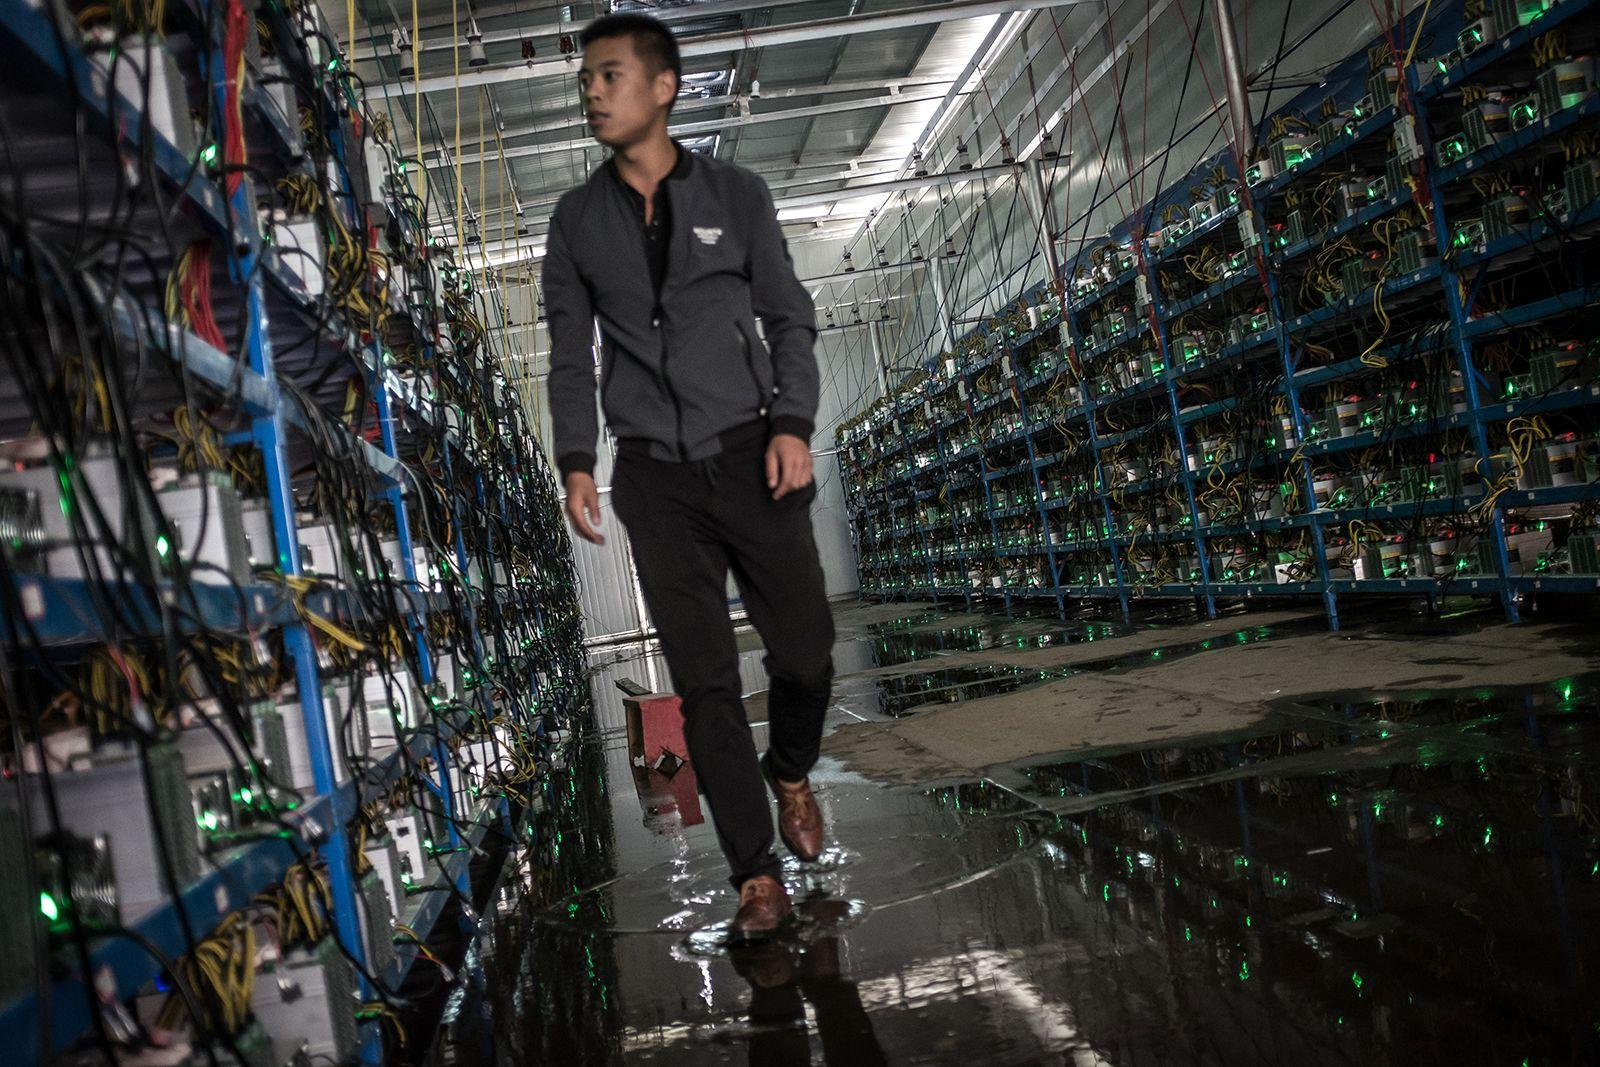 Невеселая ферма: майнинг биткоинов в китайских масштабах